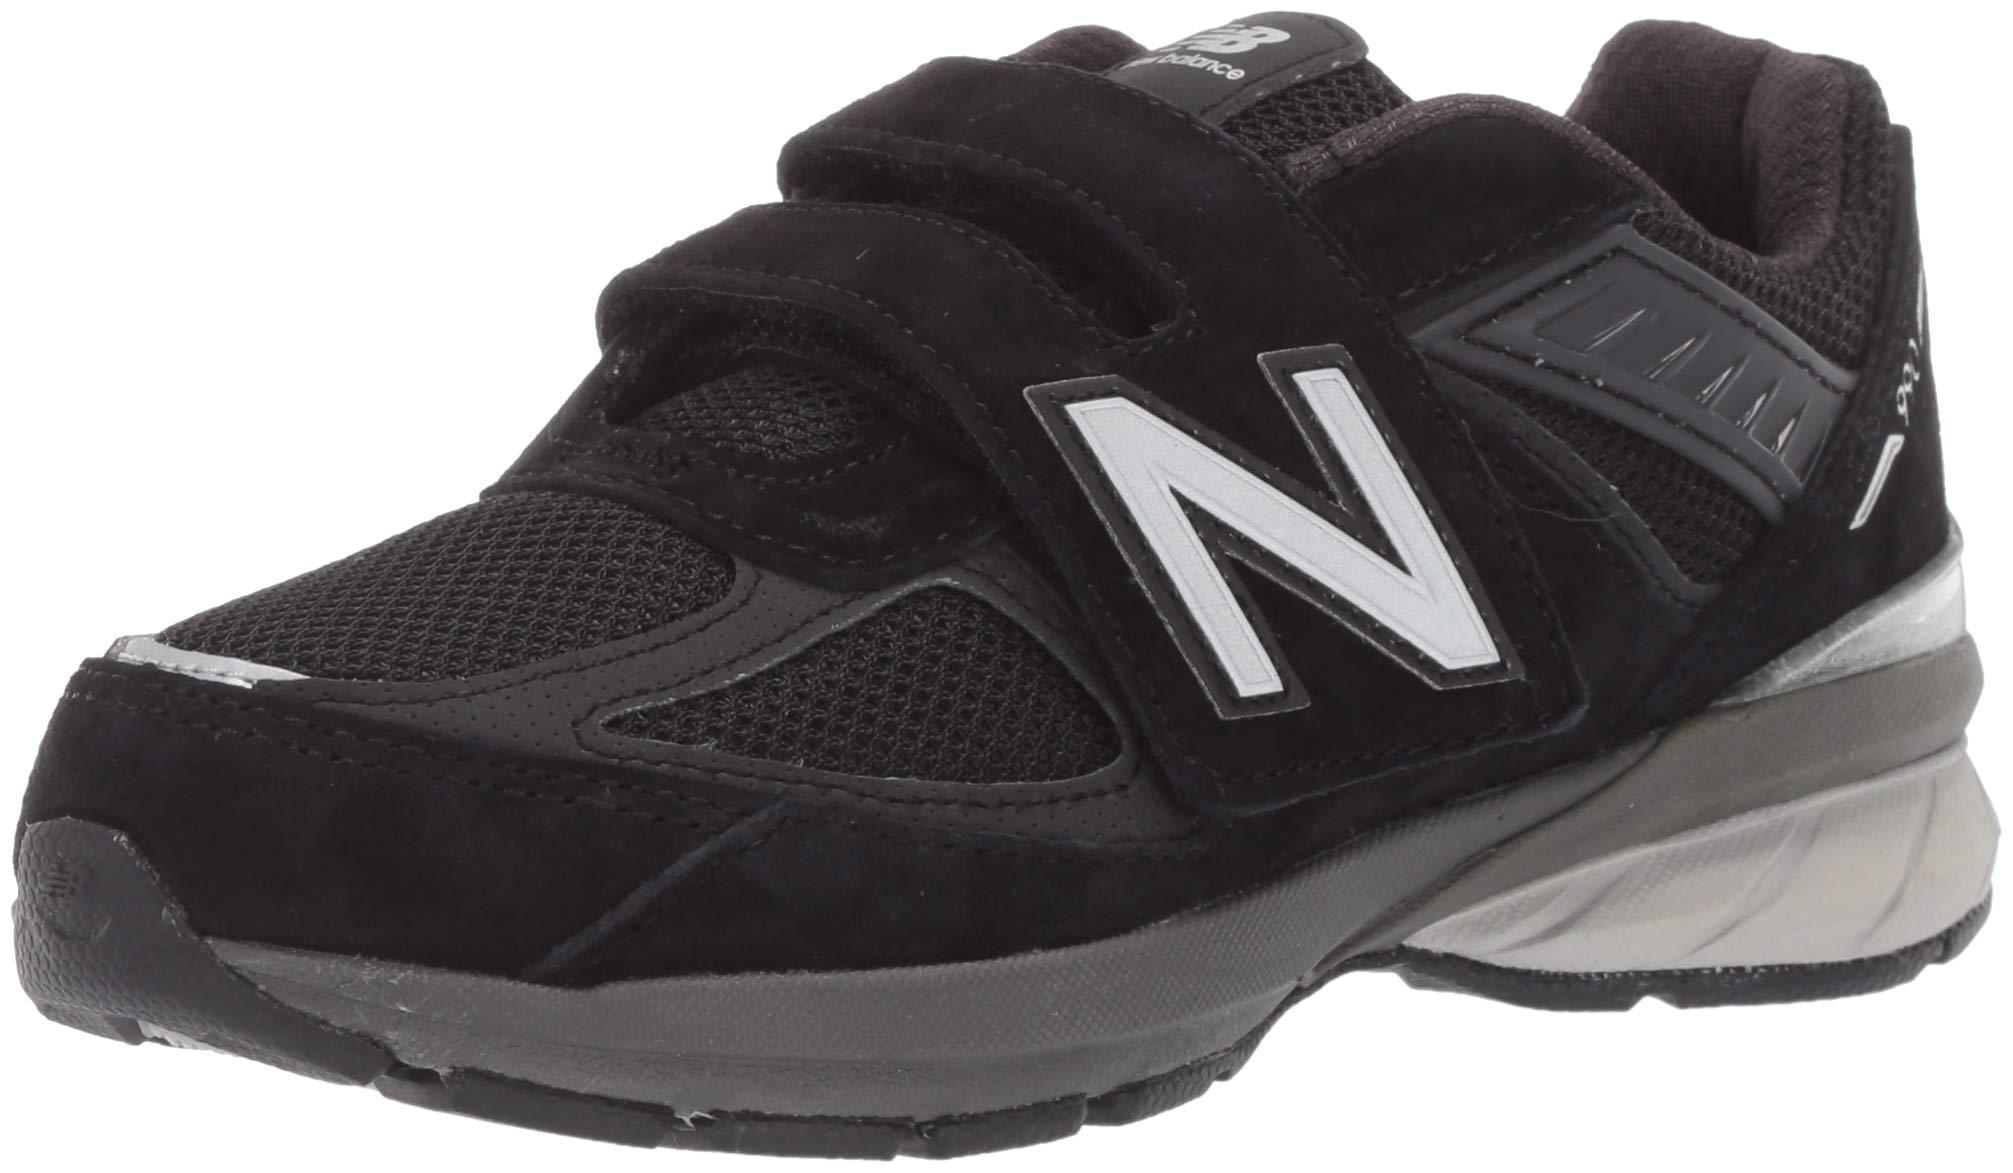 New Balance Boys' 990v5 Running Shoe, black/black, 2 XW US Little Kid by New Balance